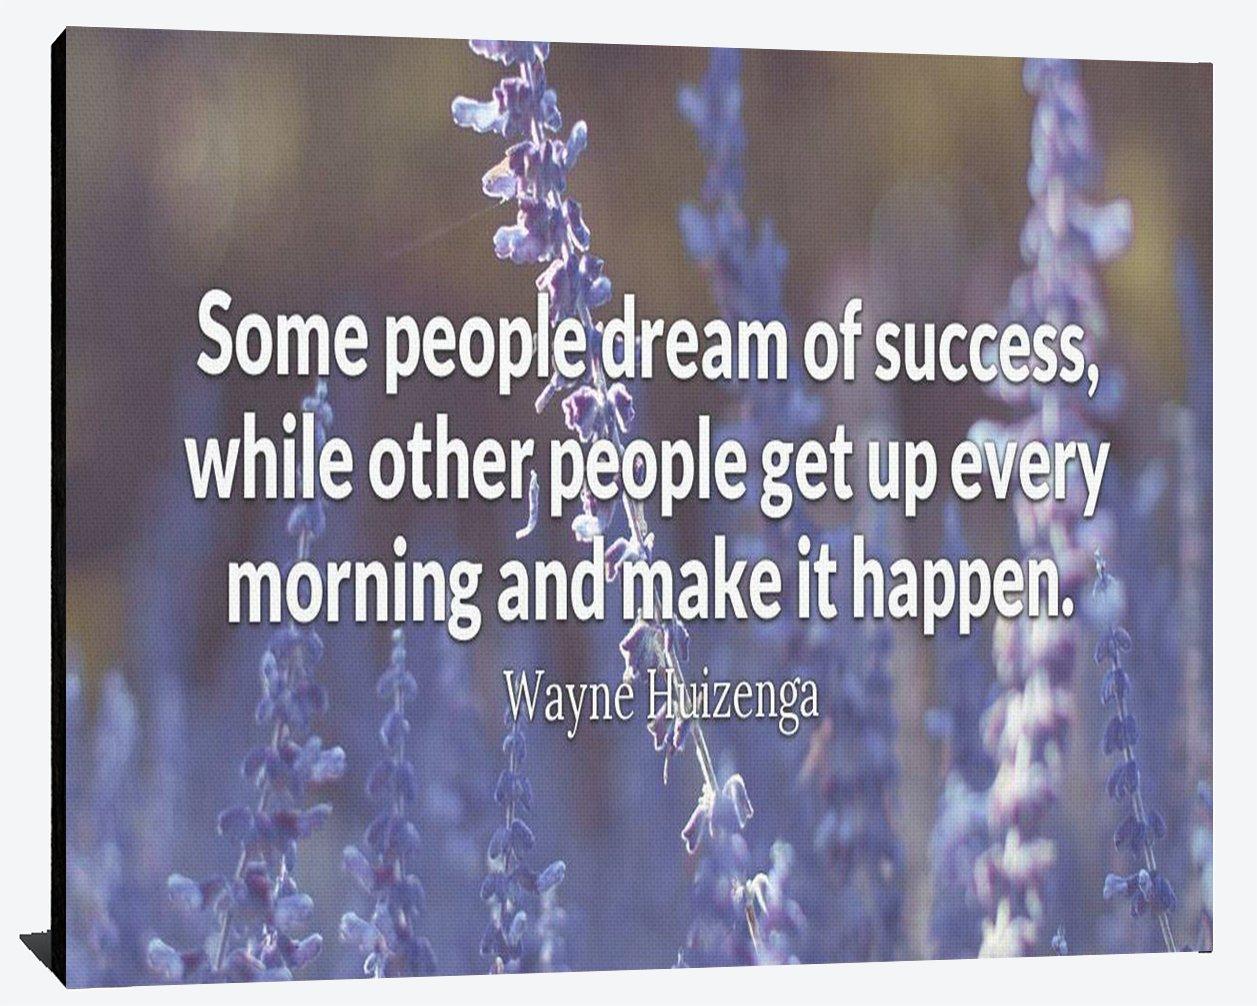 Some People Dream Of Success Others Make It Happen Wayne Huizenga Relentless Fearless Perseverance ProsperityリーダーシップHumble木製壁アート印刷写真イメージDecor 11.75 X 9.375 Inches WOOD2748-size9.375 B079T7CXWV  11.75 X 9.375 Inches